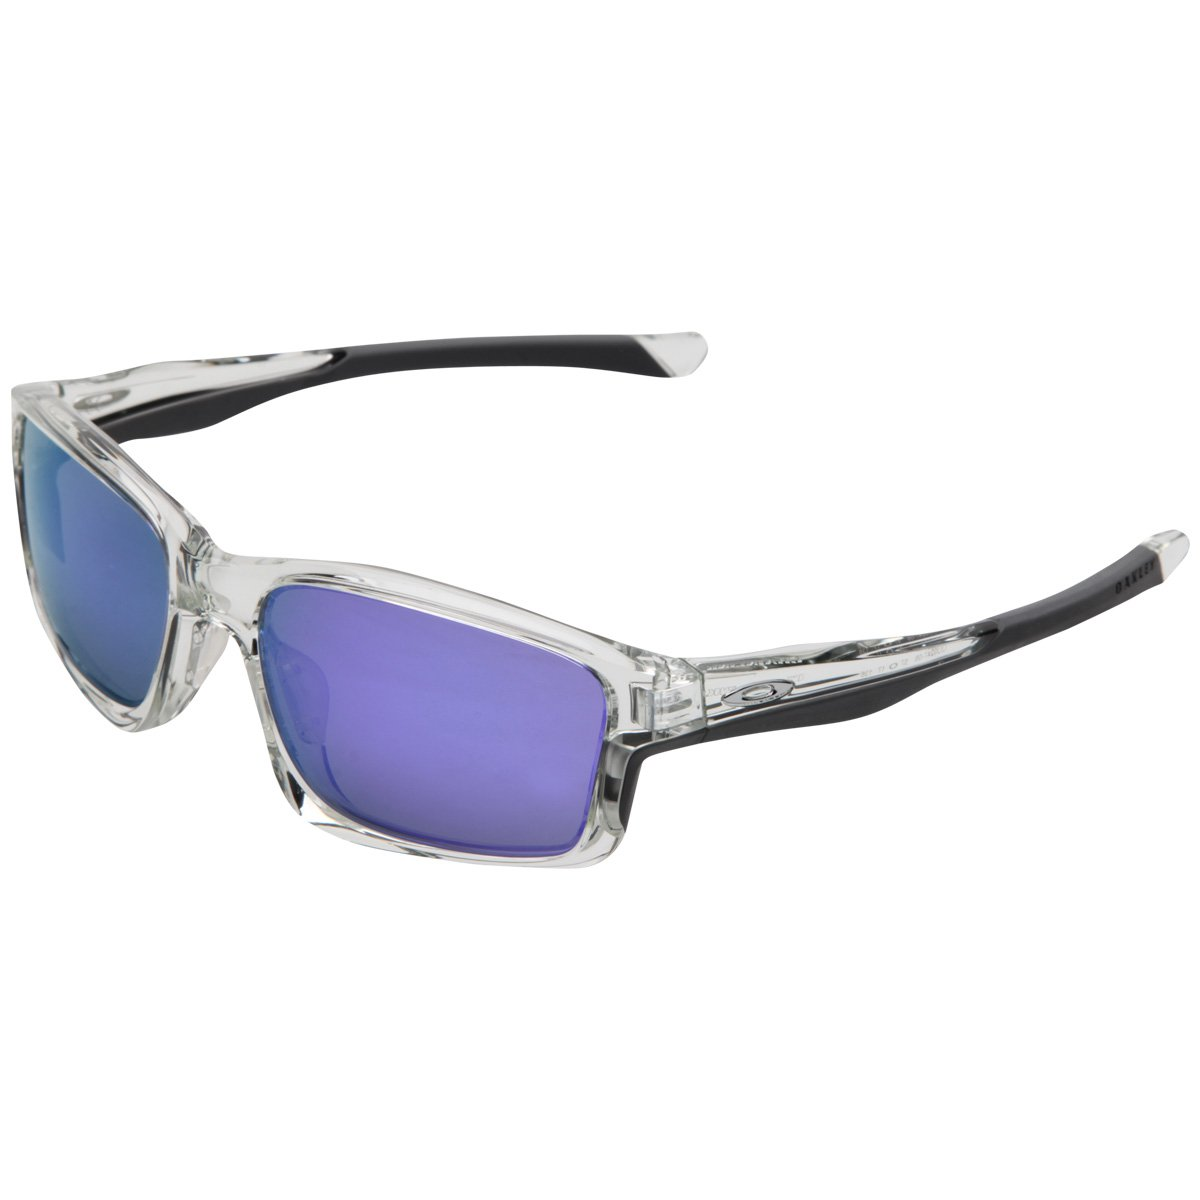 522ae3599 Oculos Oakley One Year Warranty | Louisiana Bucket Brigade